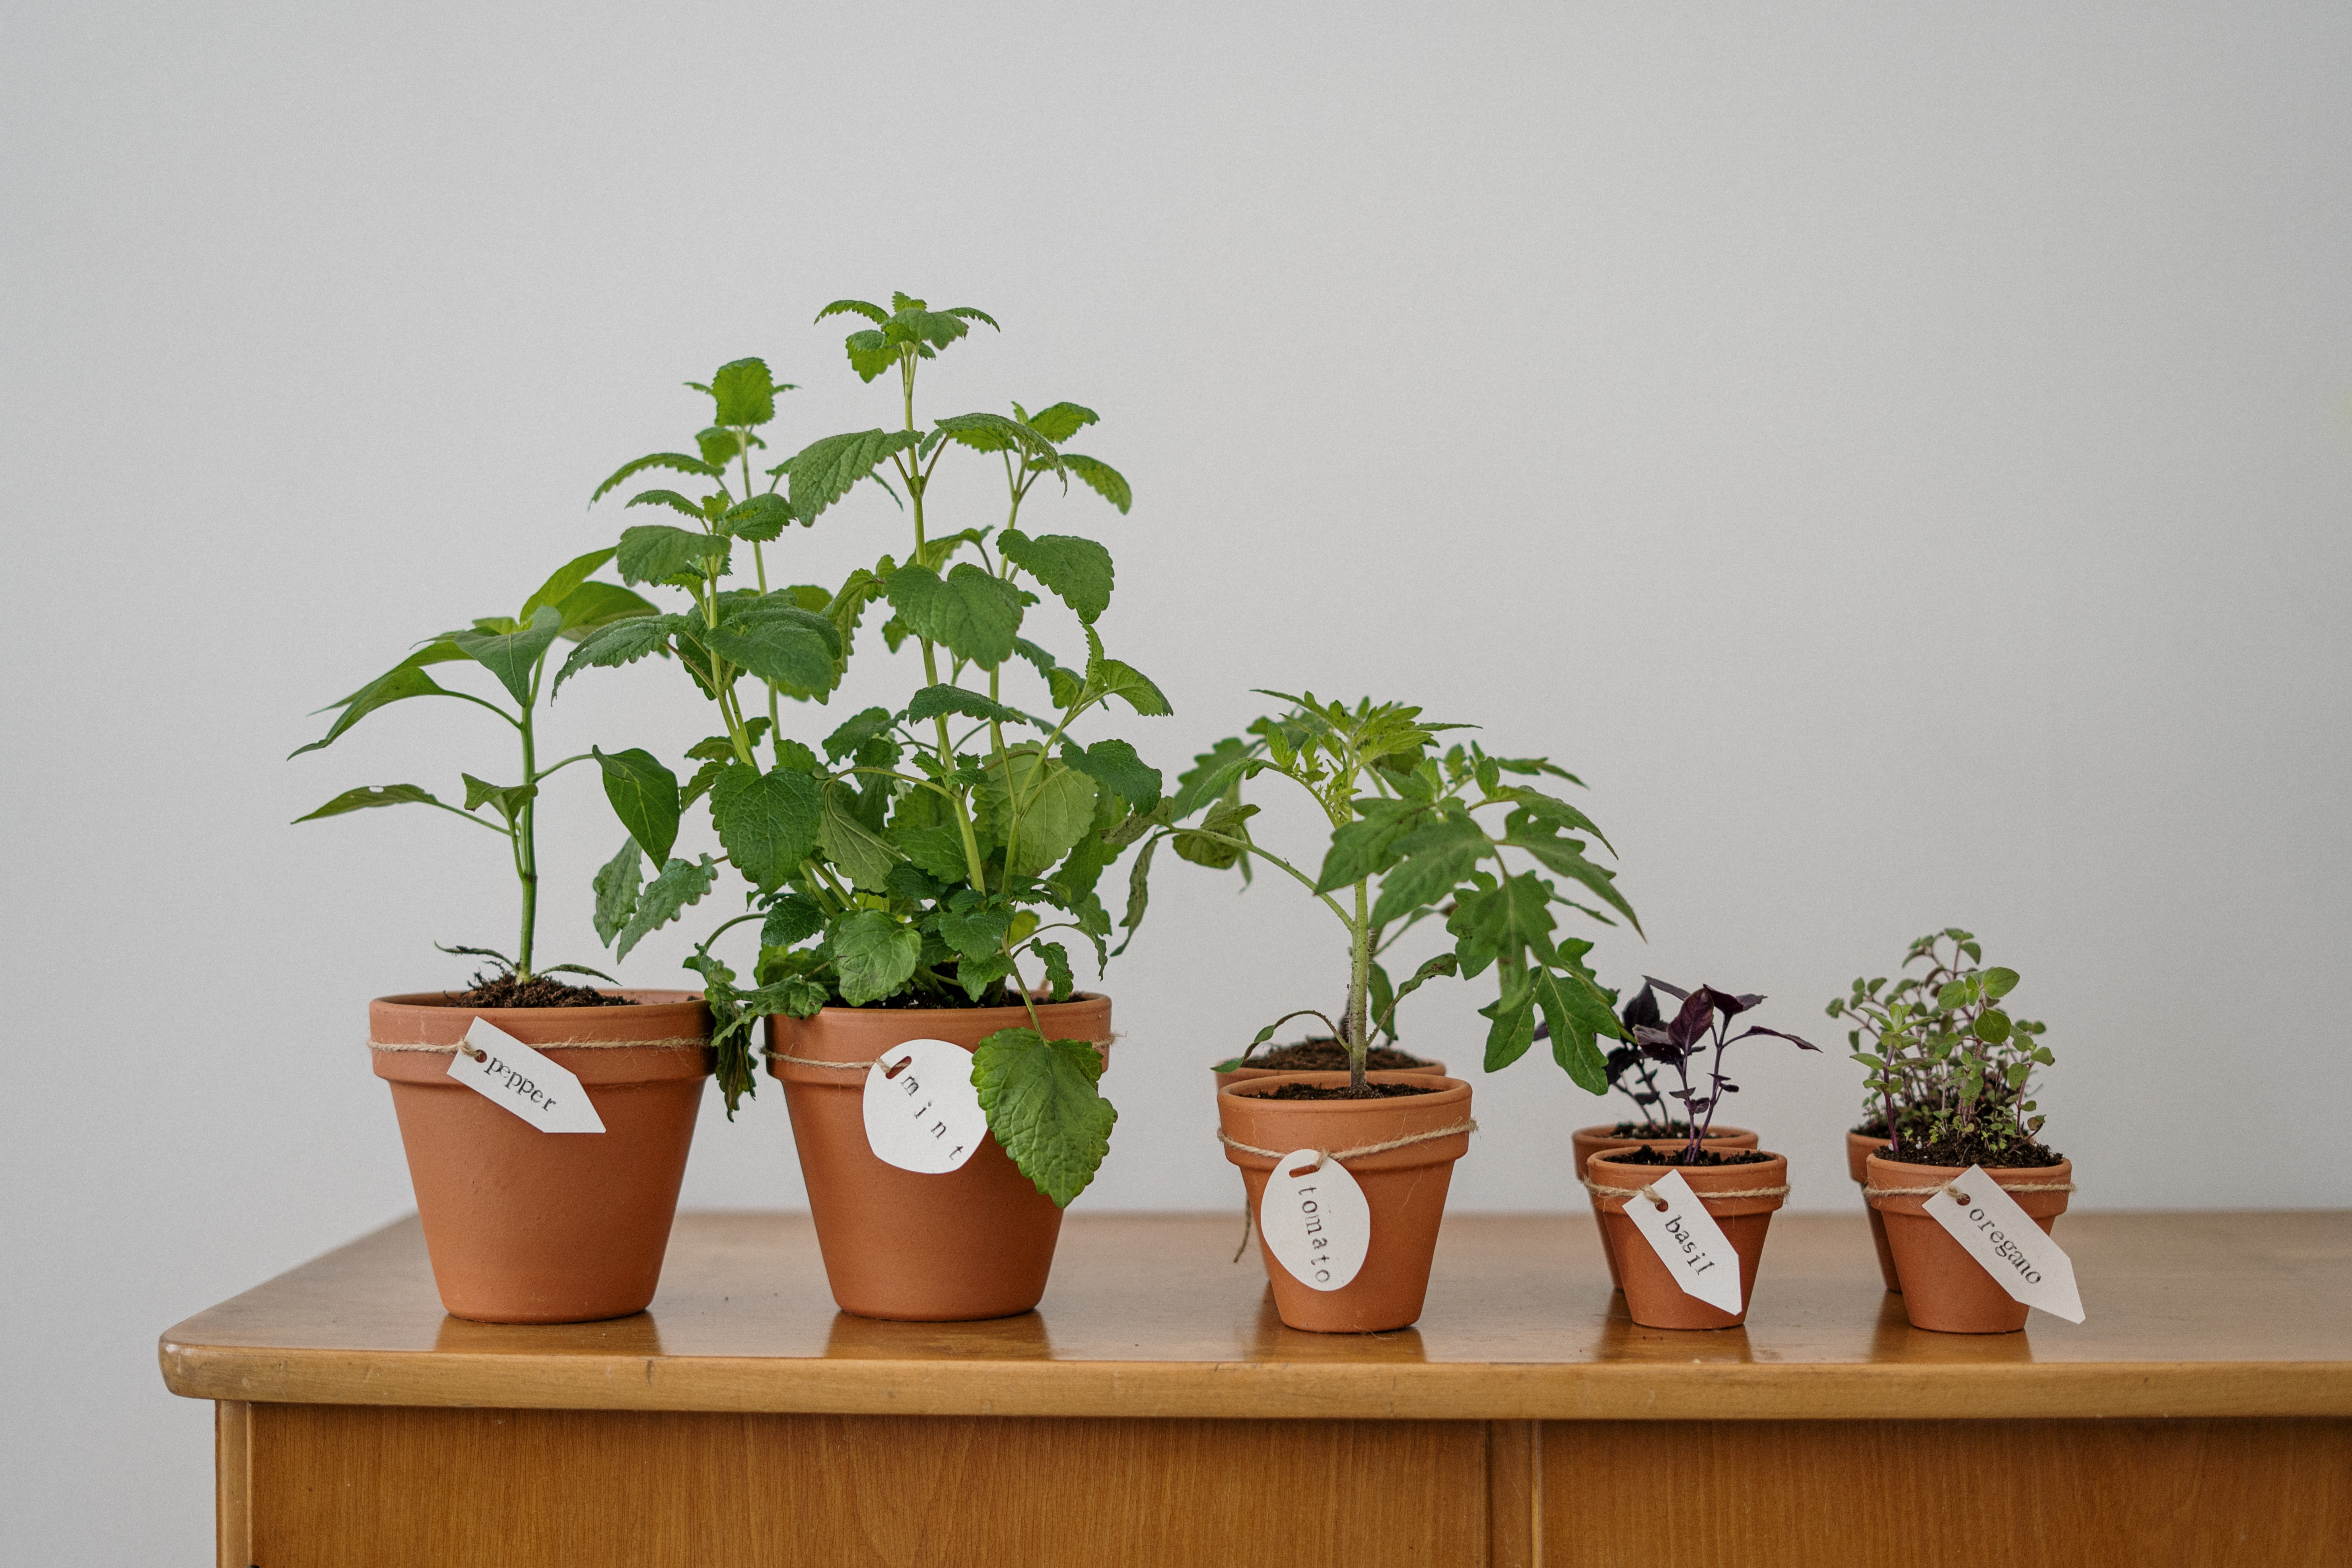 Illinois Indoor Gardening